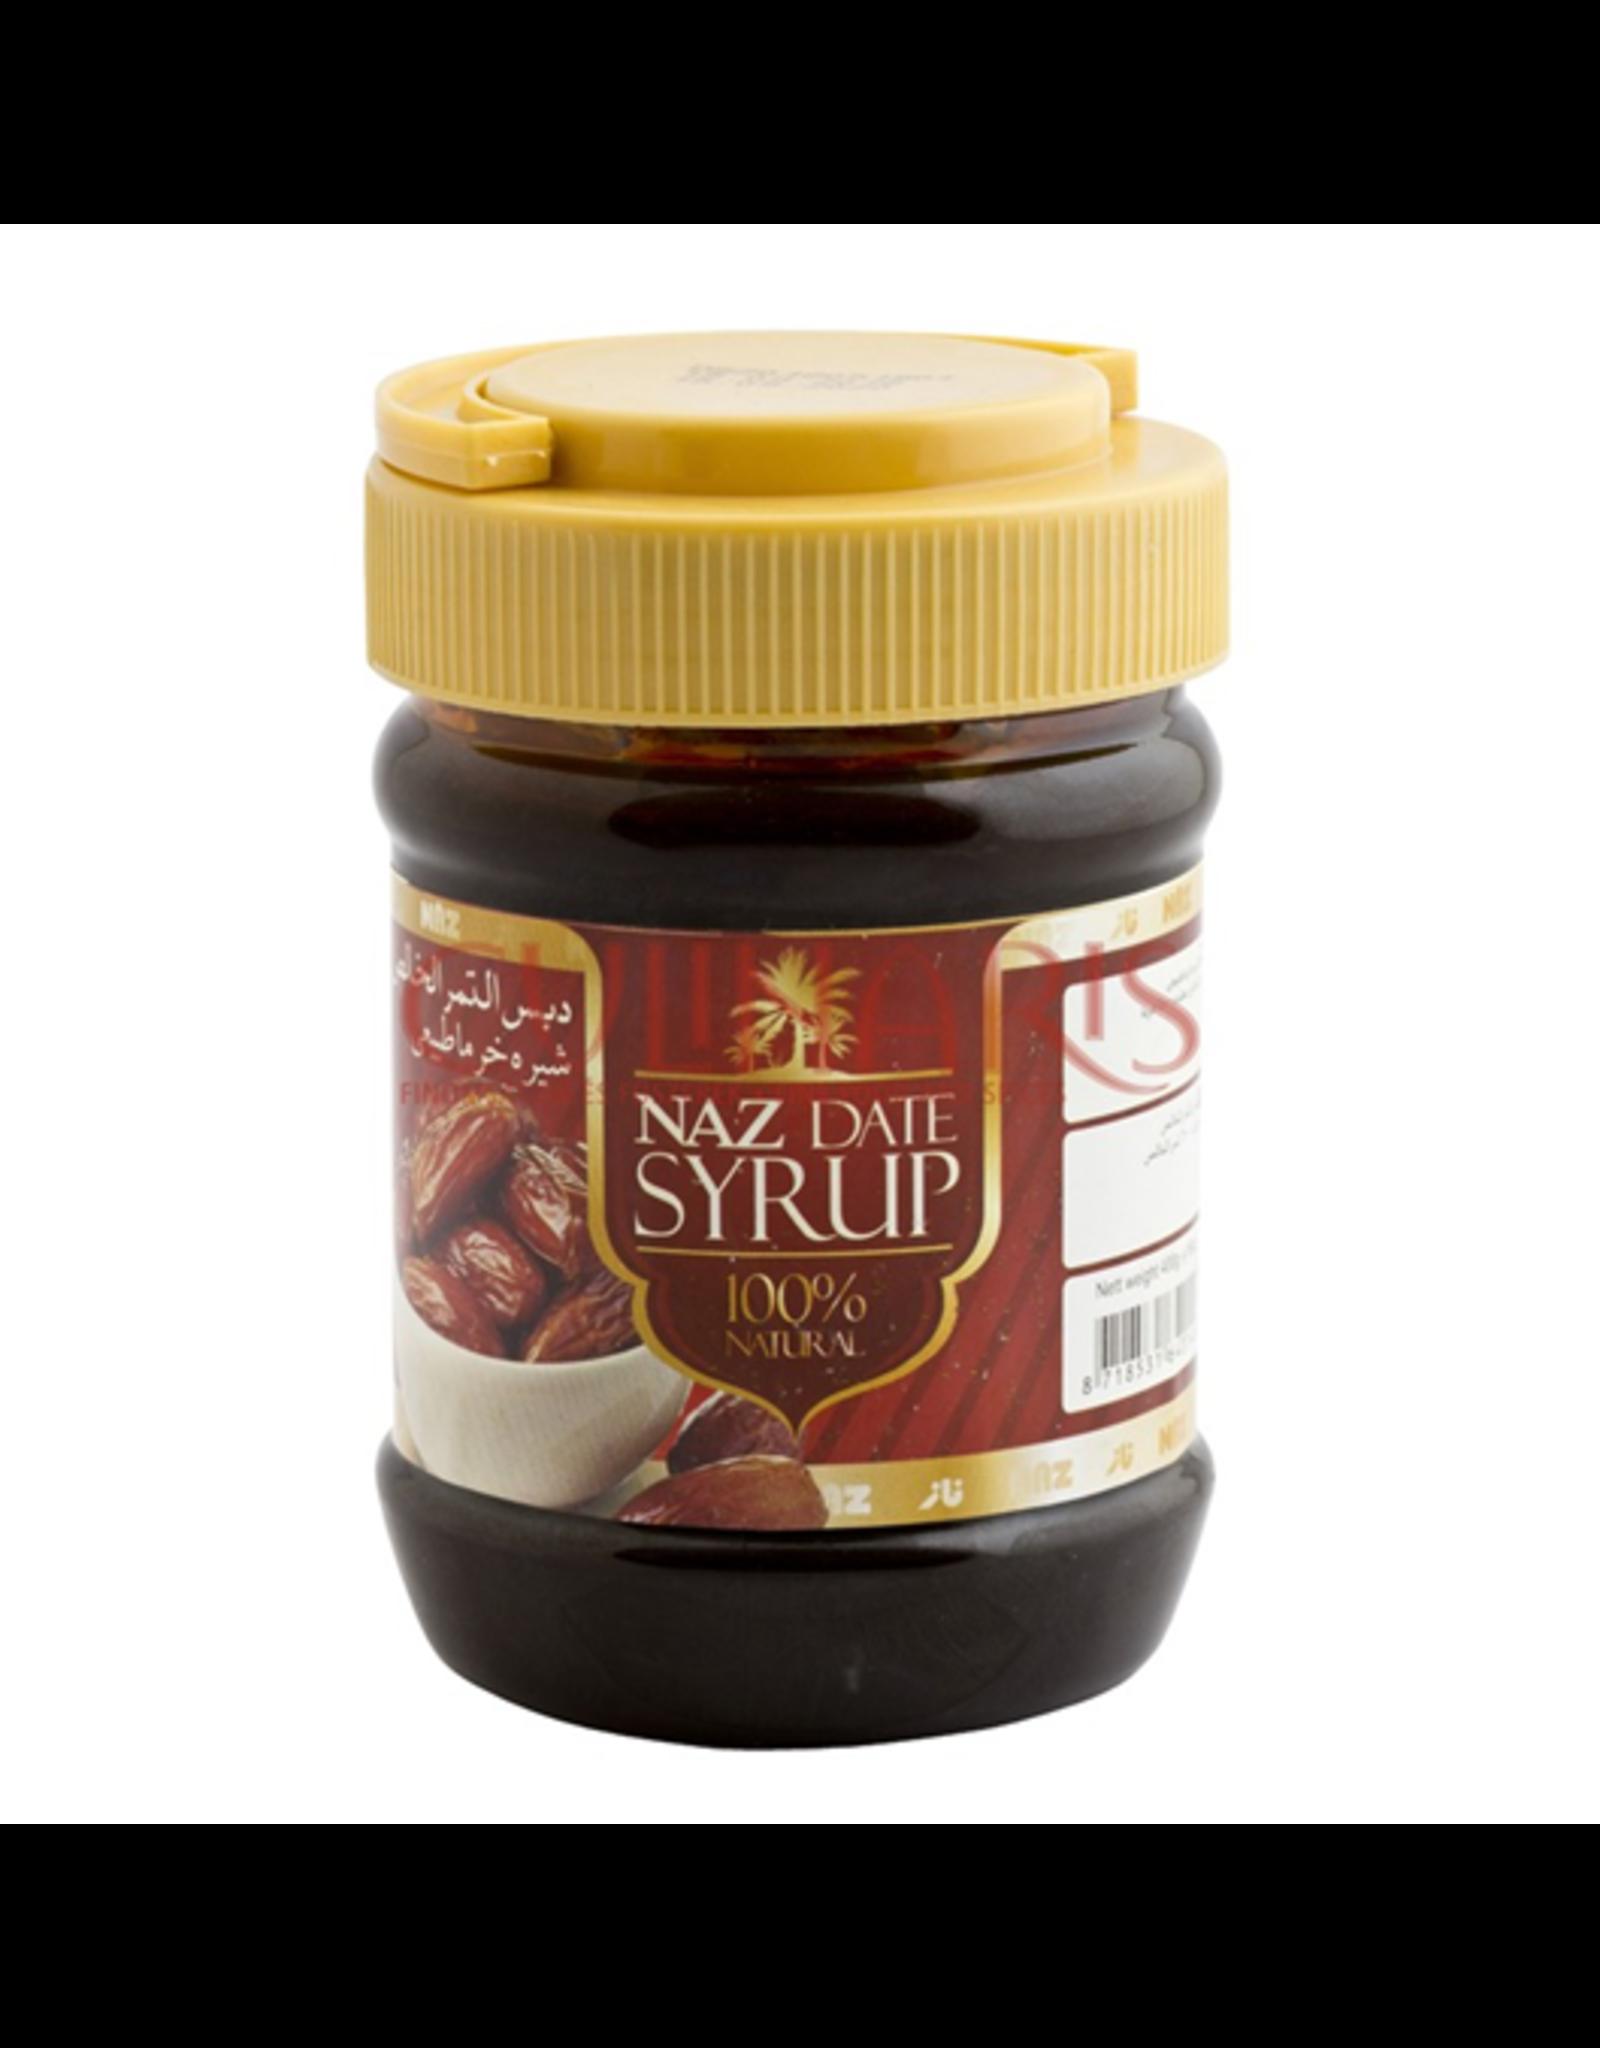 Naz Date Syrup